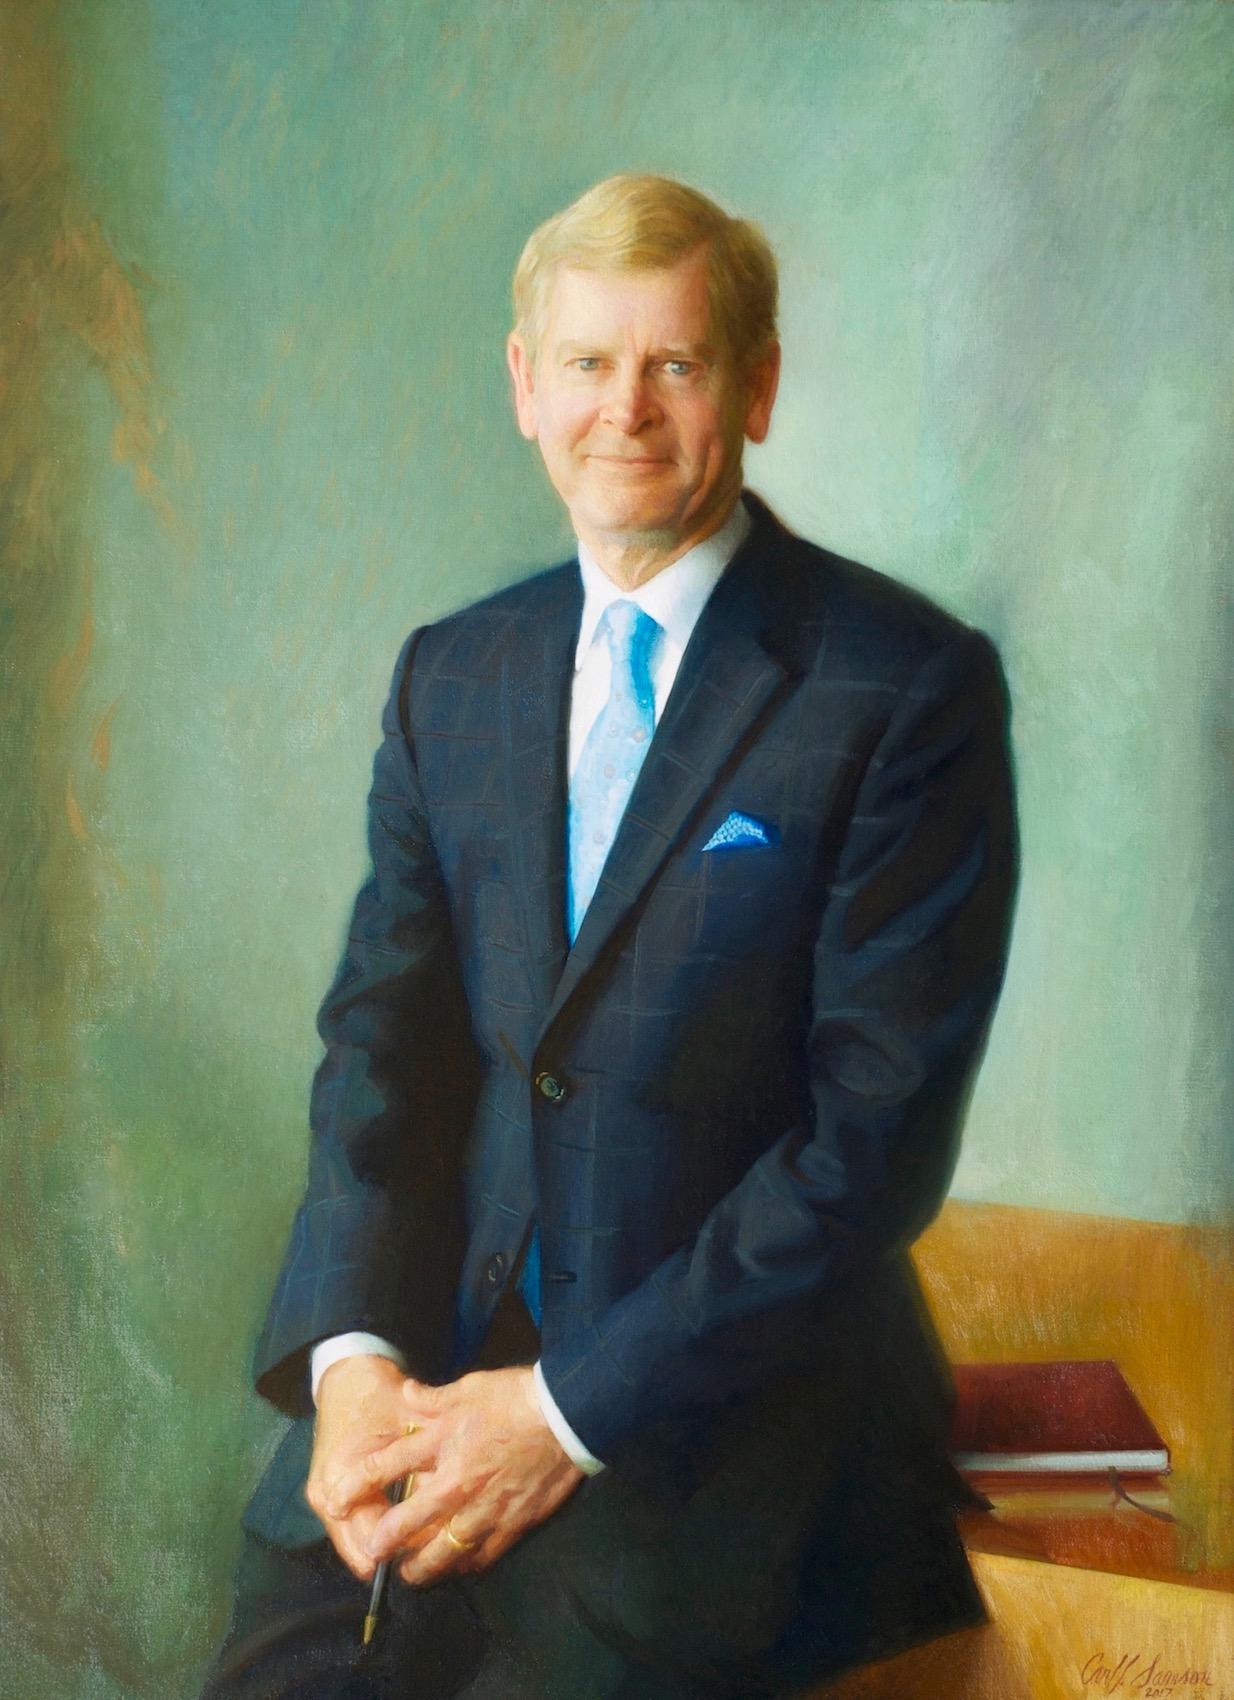 "Oil Portrait of David S. Taylor, CEO , 46"" x 34"", oil on linen canvas, Procter & Gamble collection"